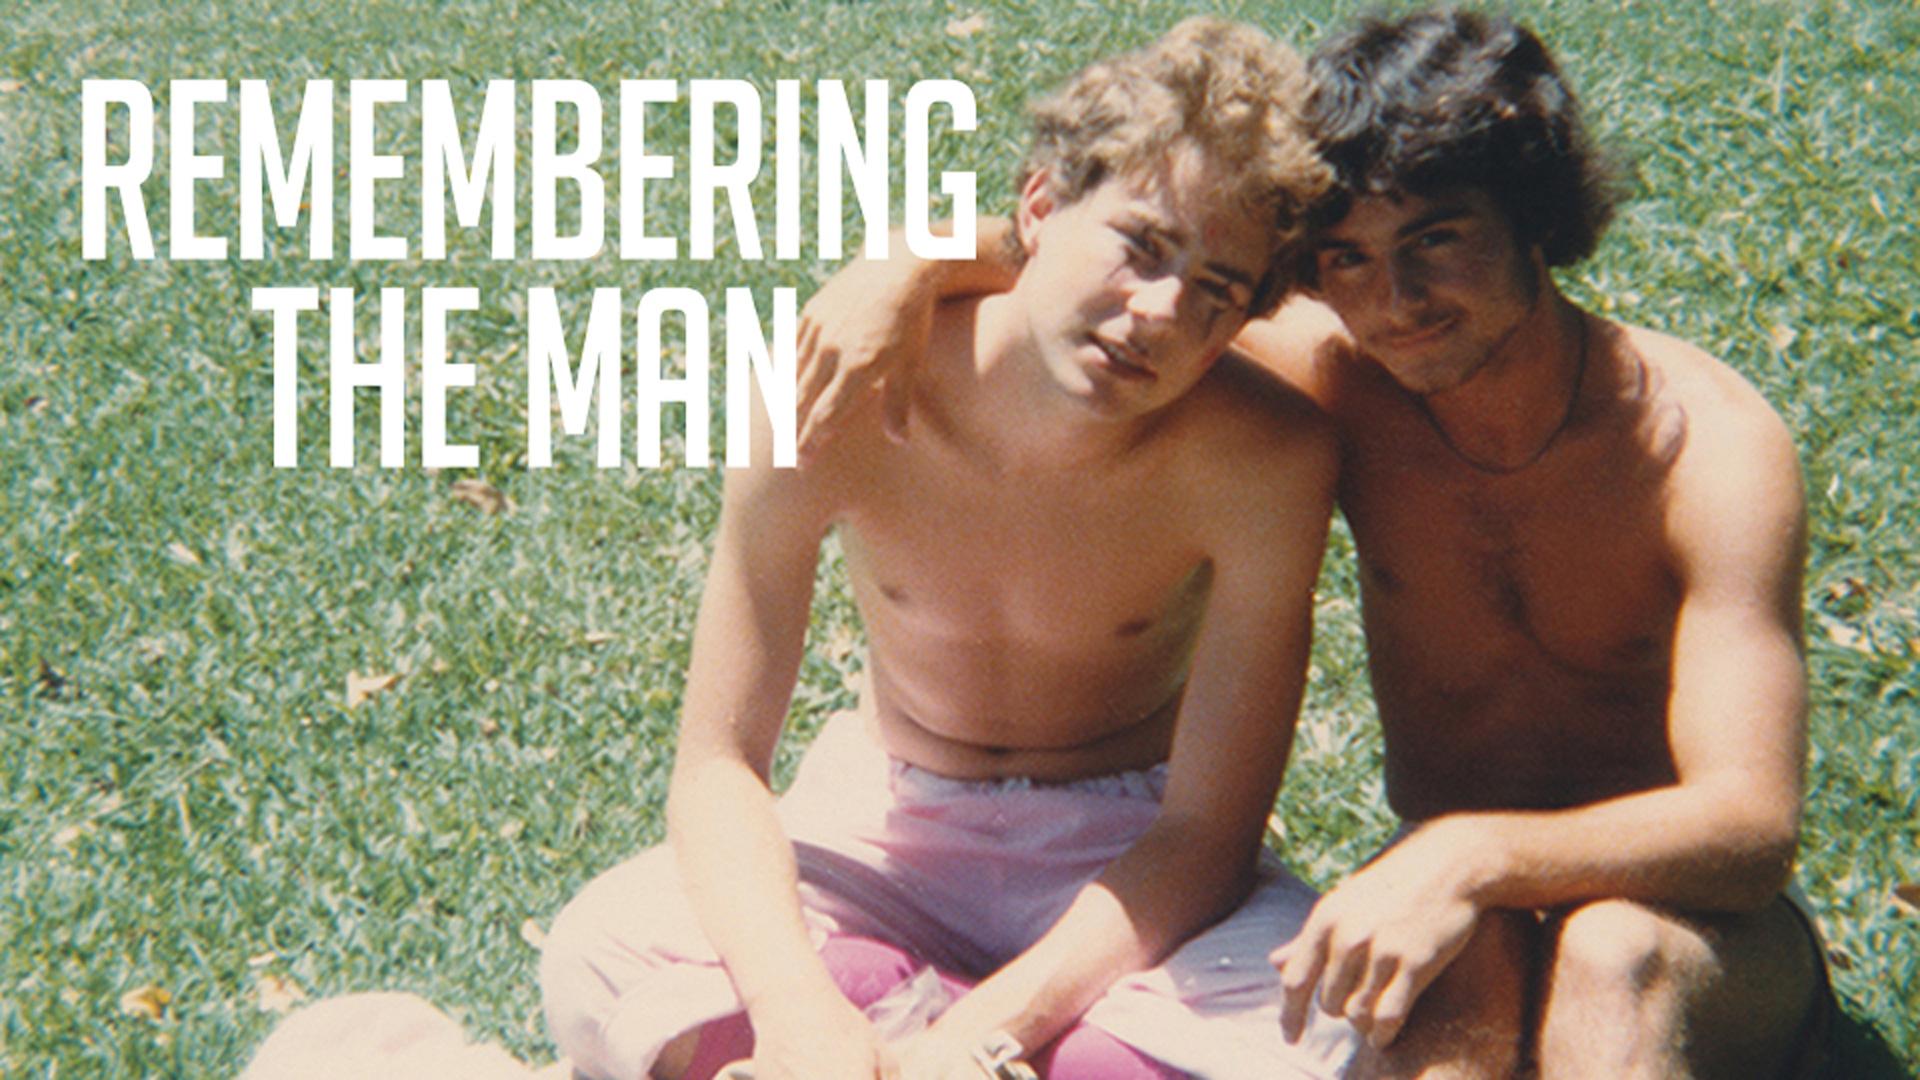 Remembering the Man [OV]